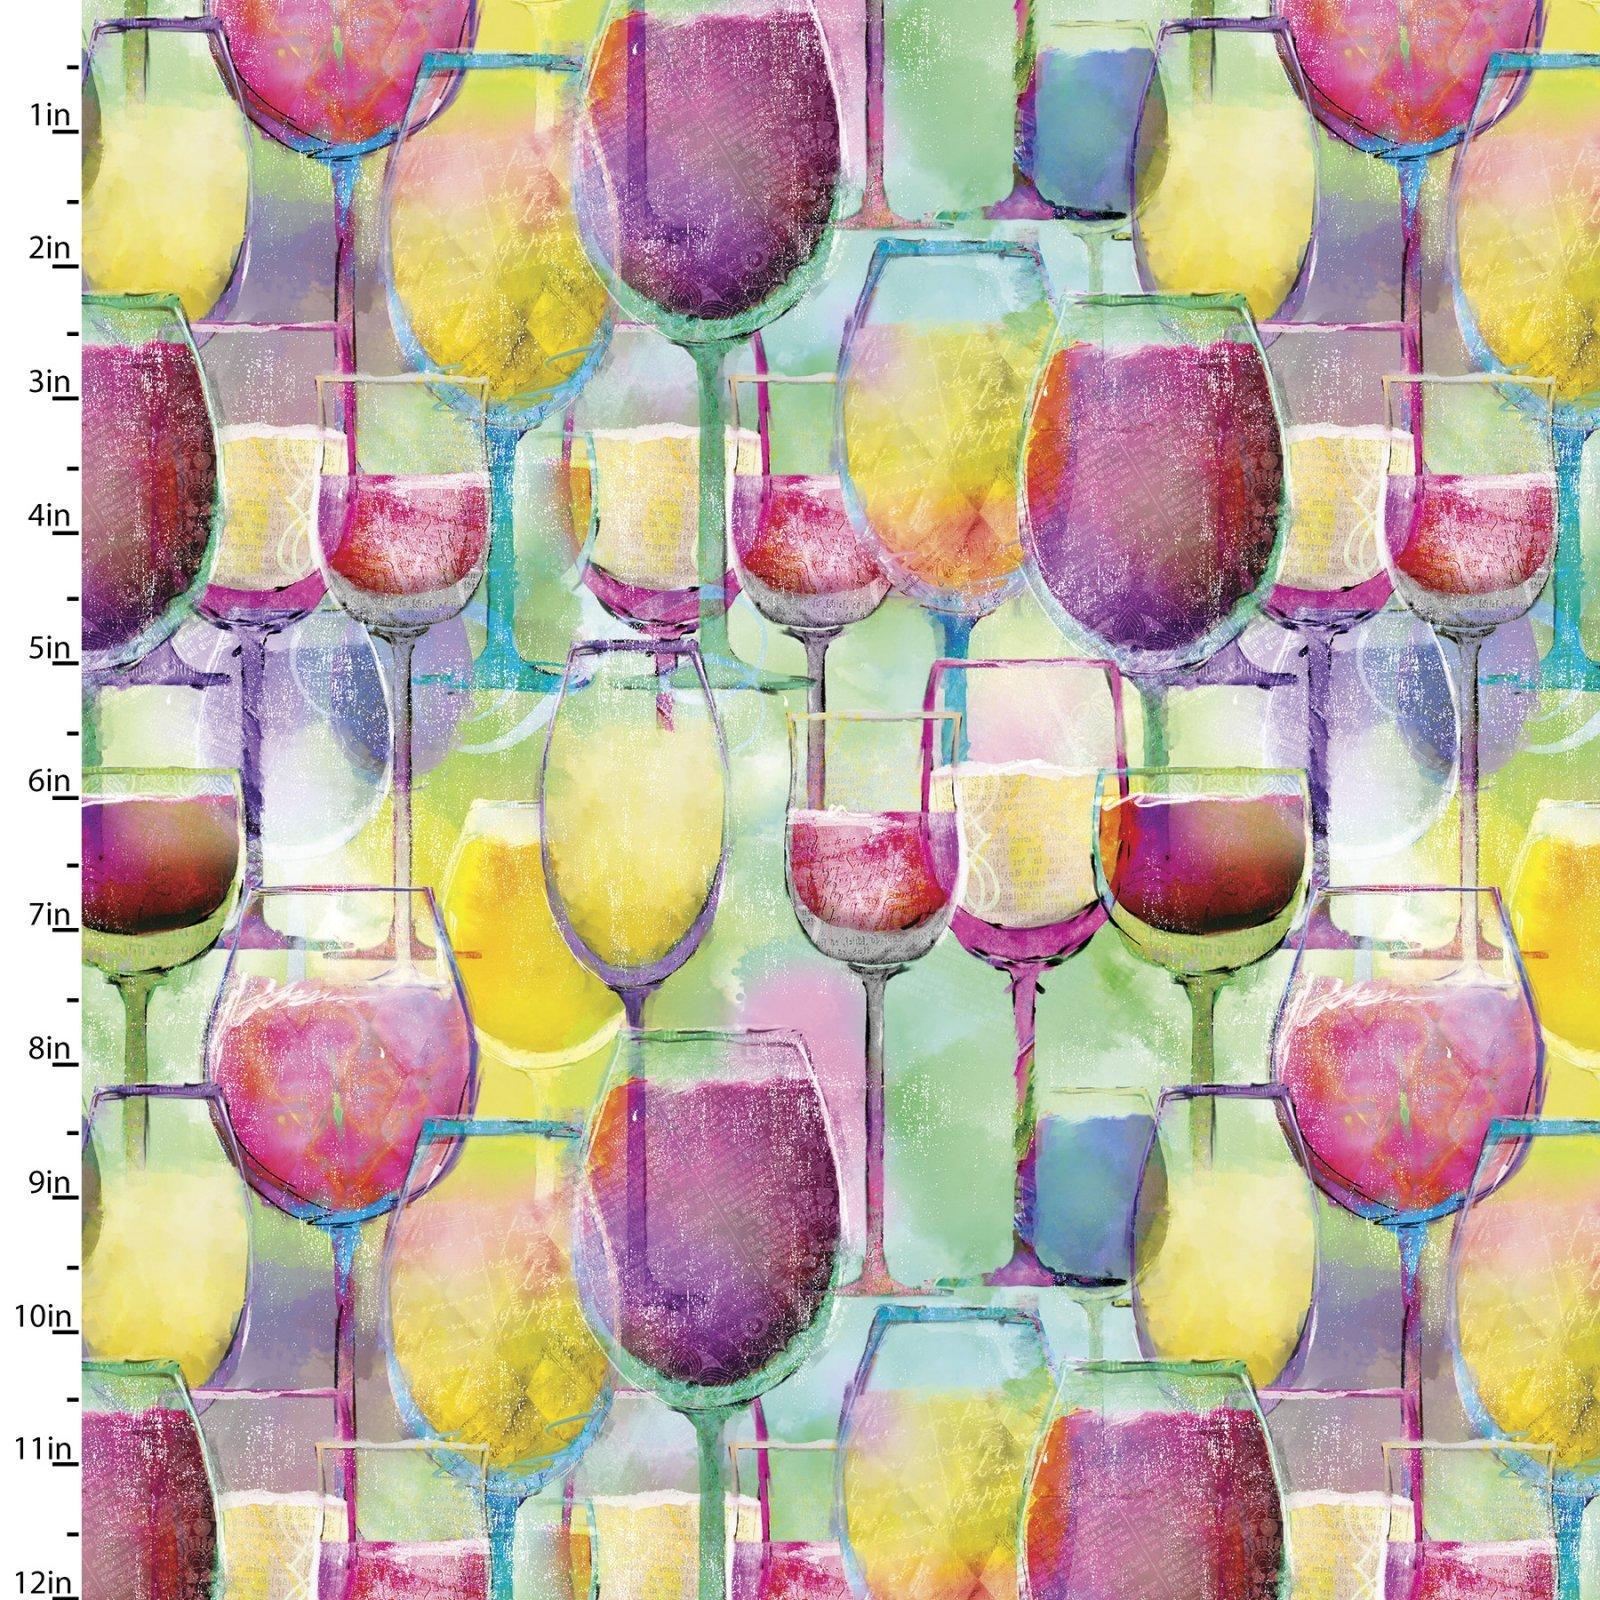 SIP & SNIP WINE GLASSES